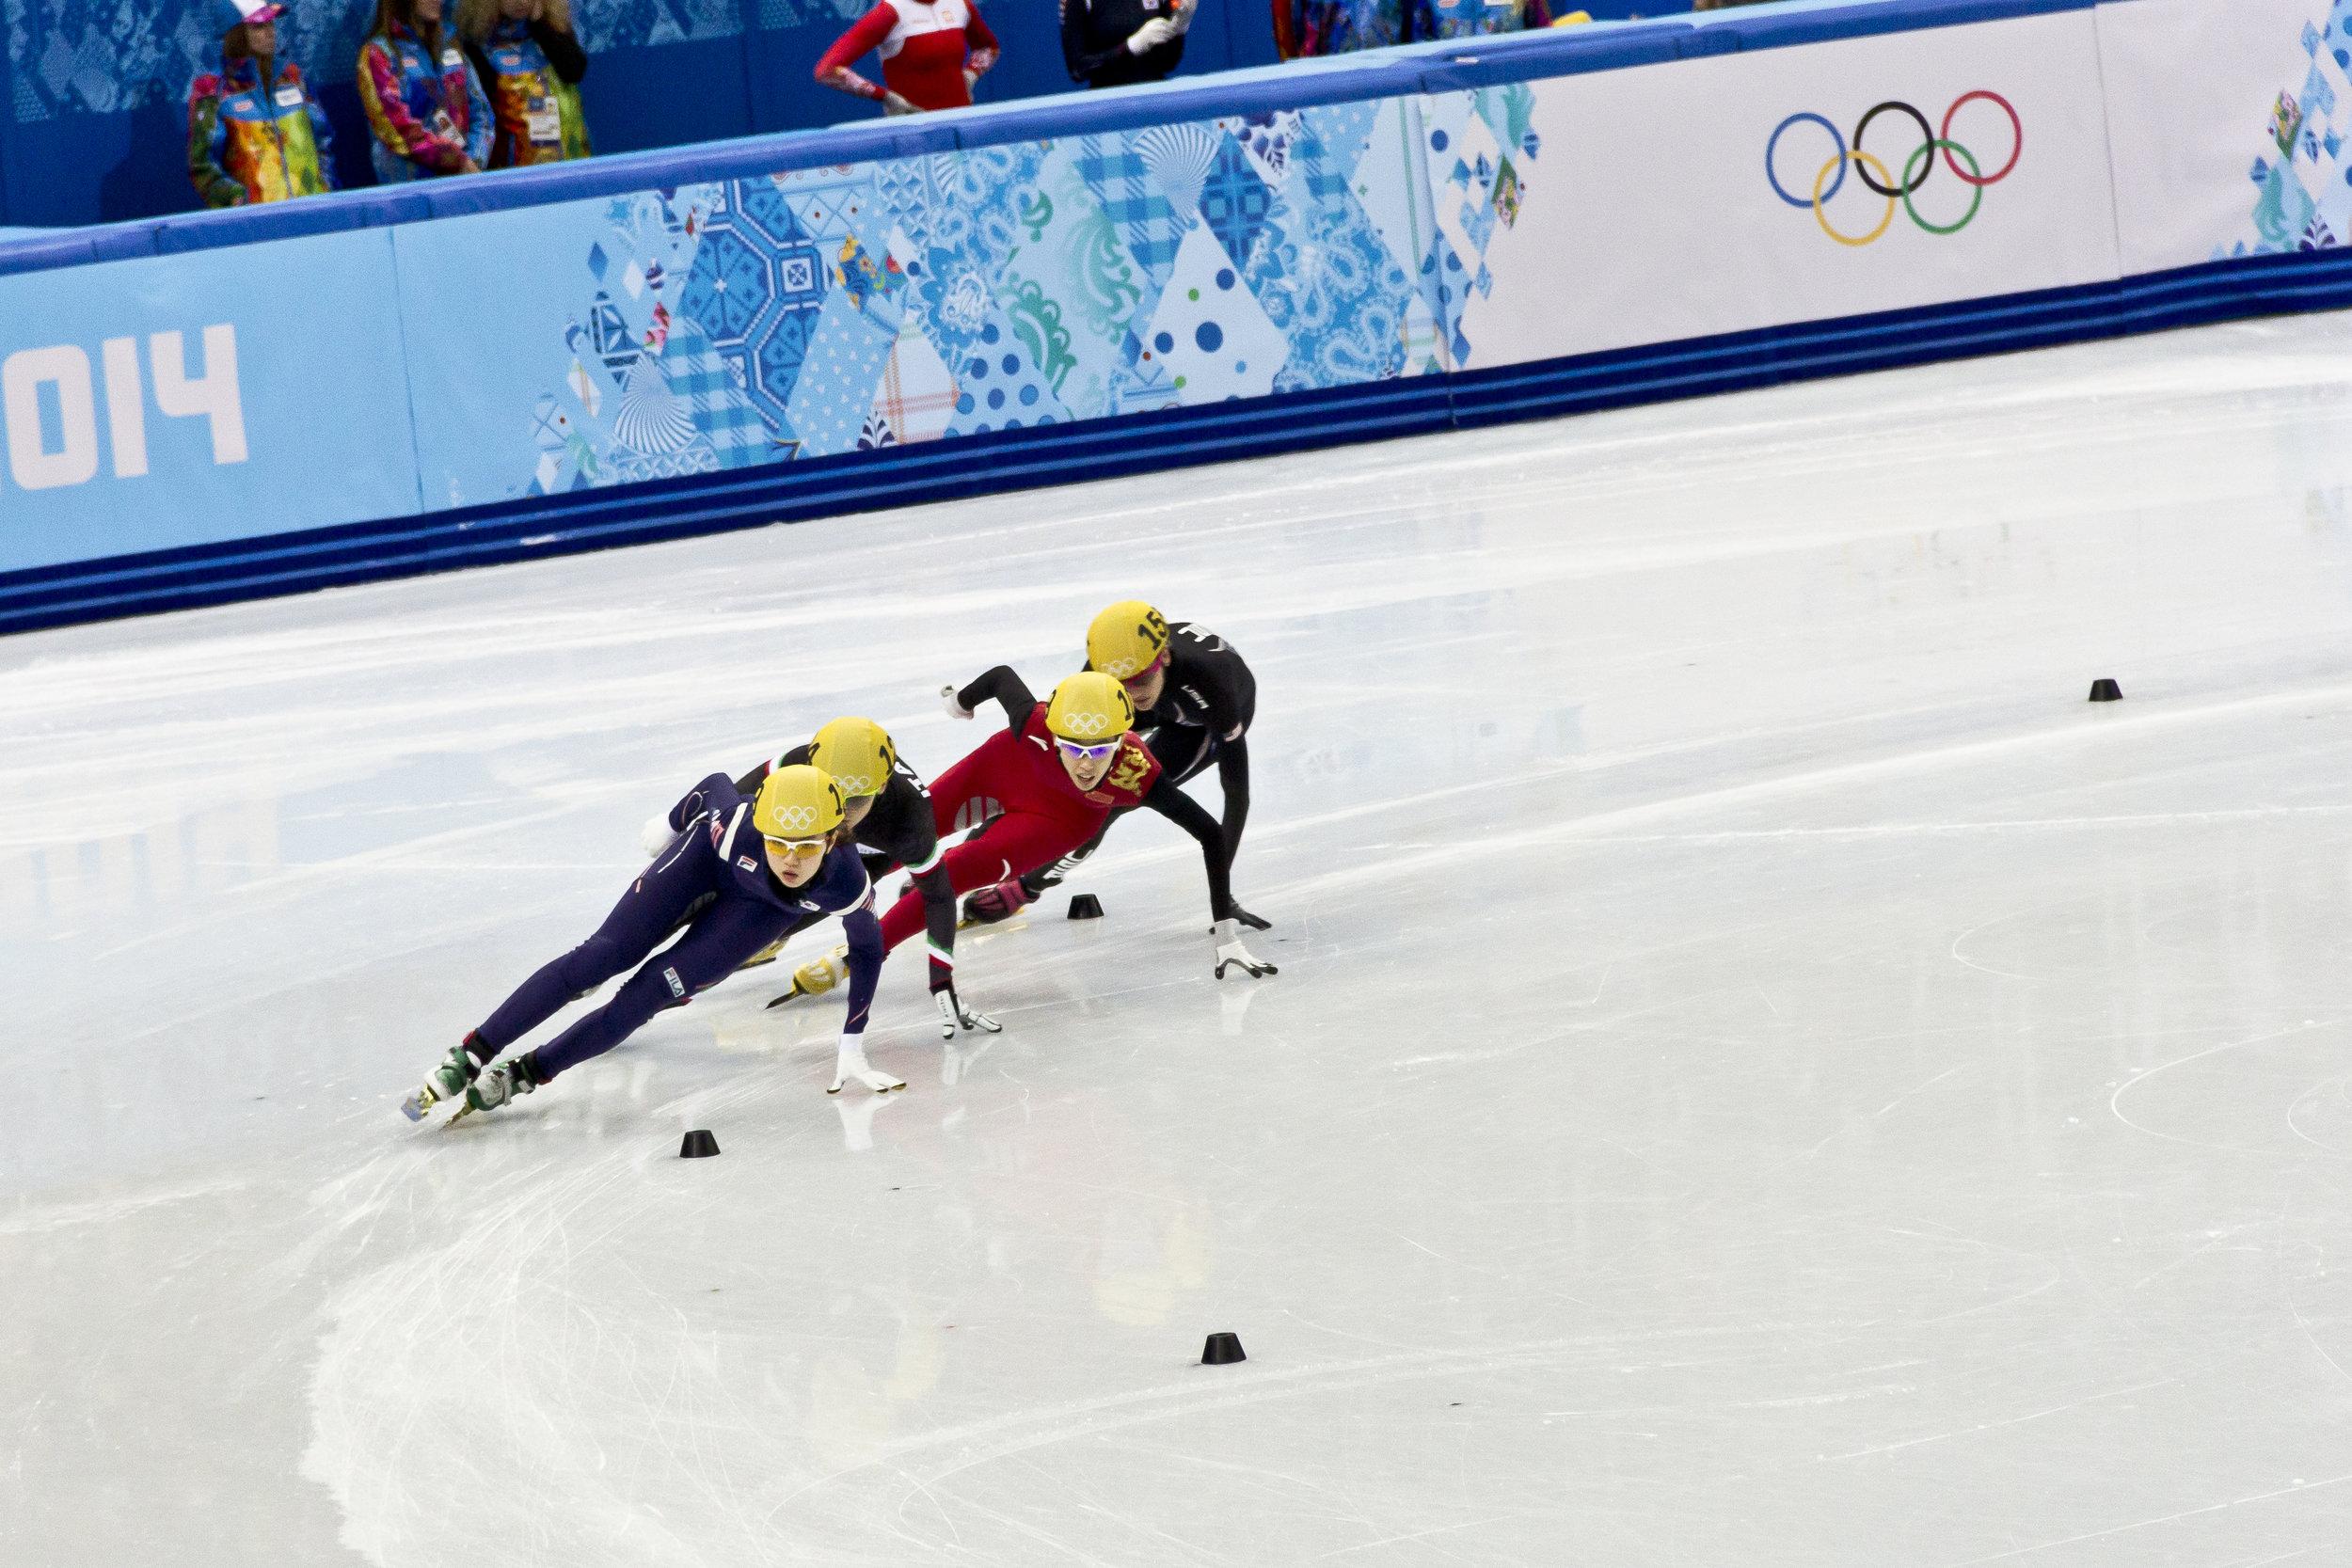 Women's short track speed skating at the 2014 Winter Olympics. Image by Pawel Maryanov.